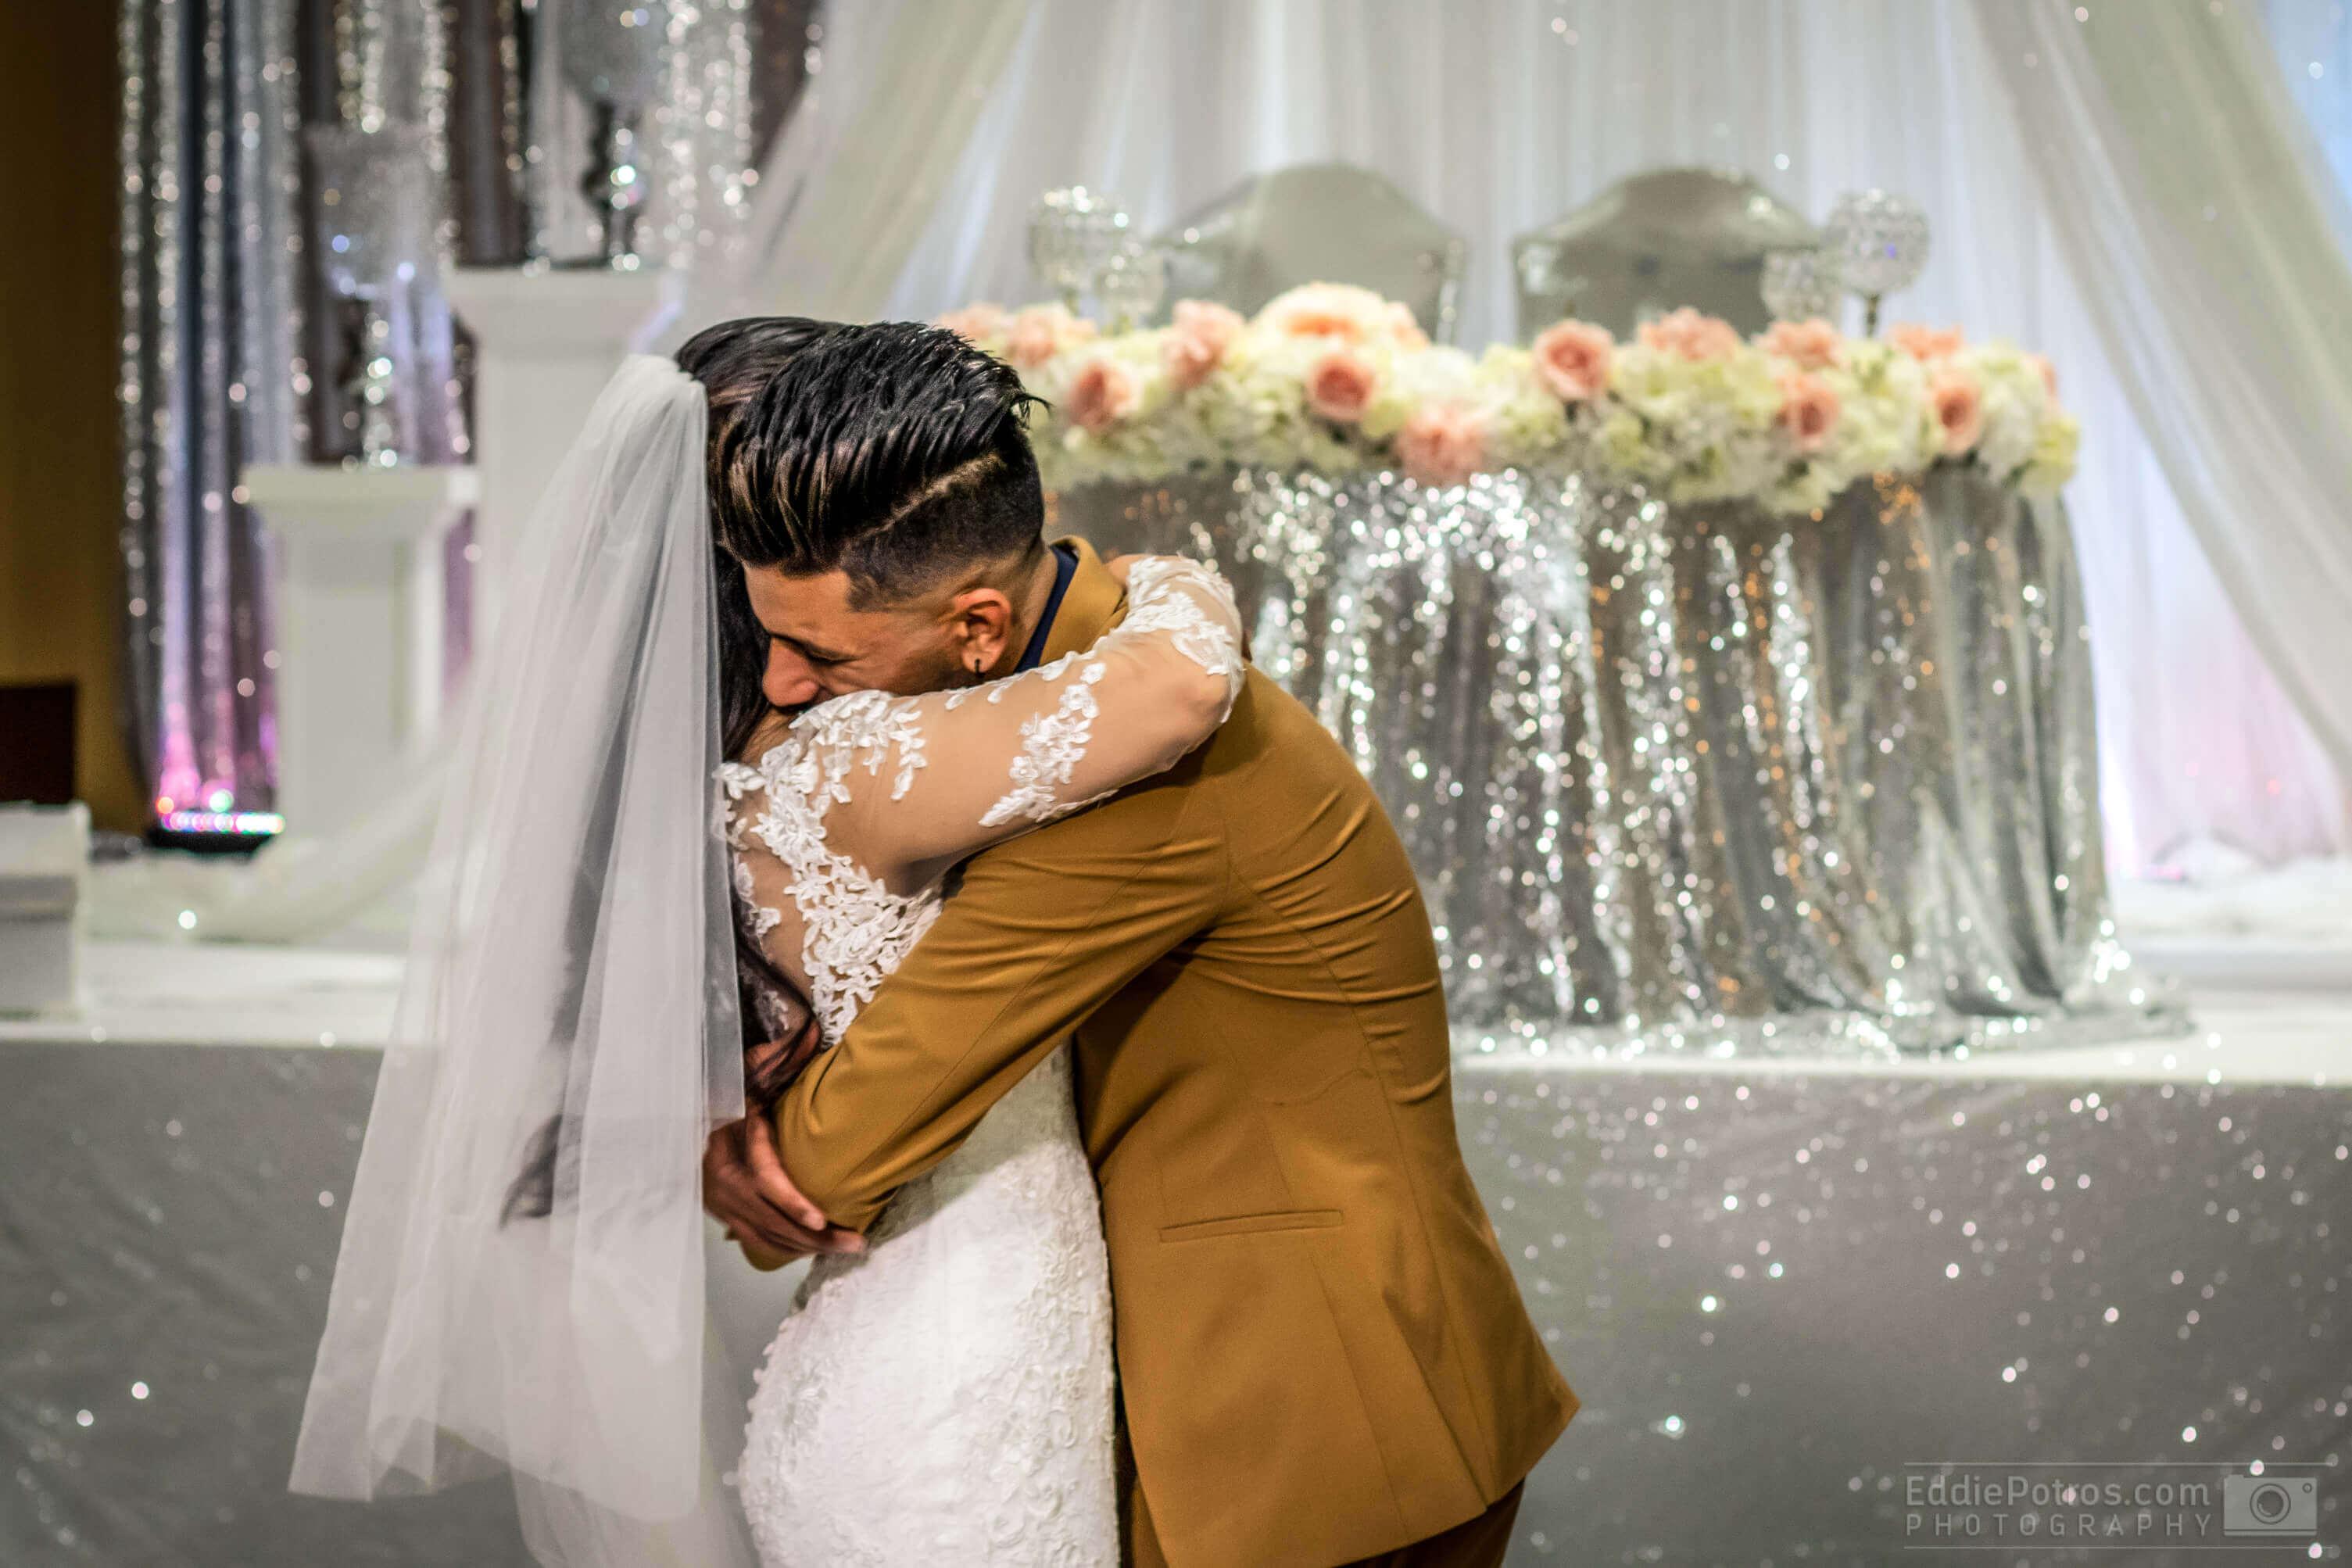 Congratulations Sarmad & Manar on your Wedding